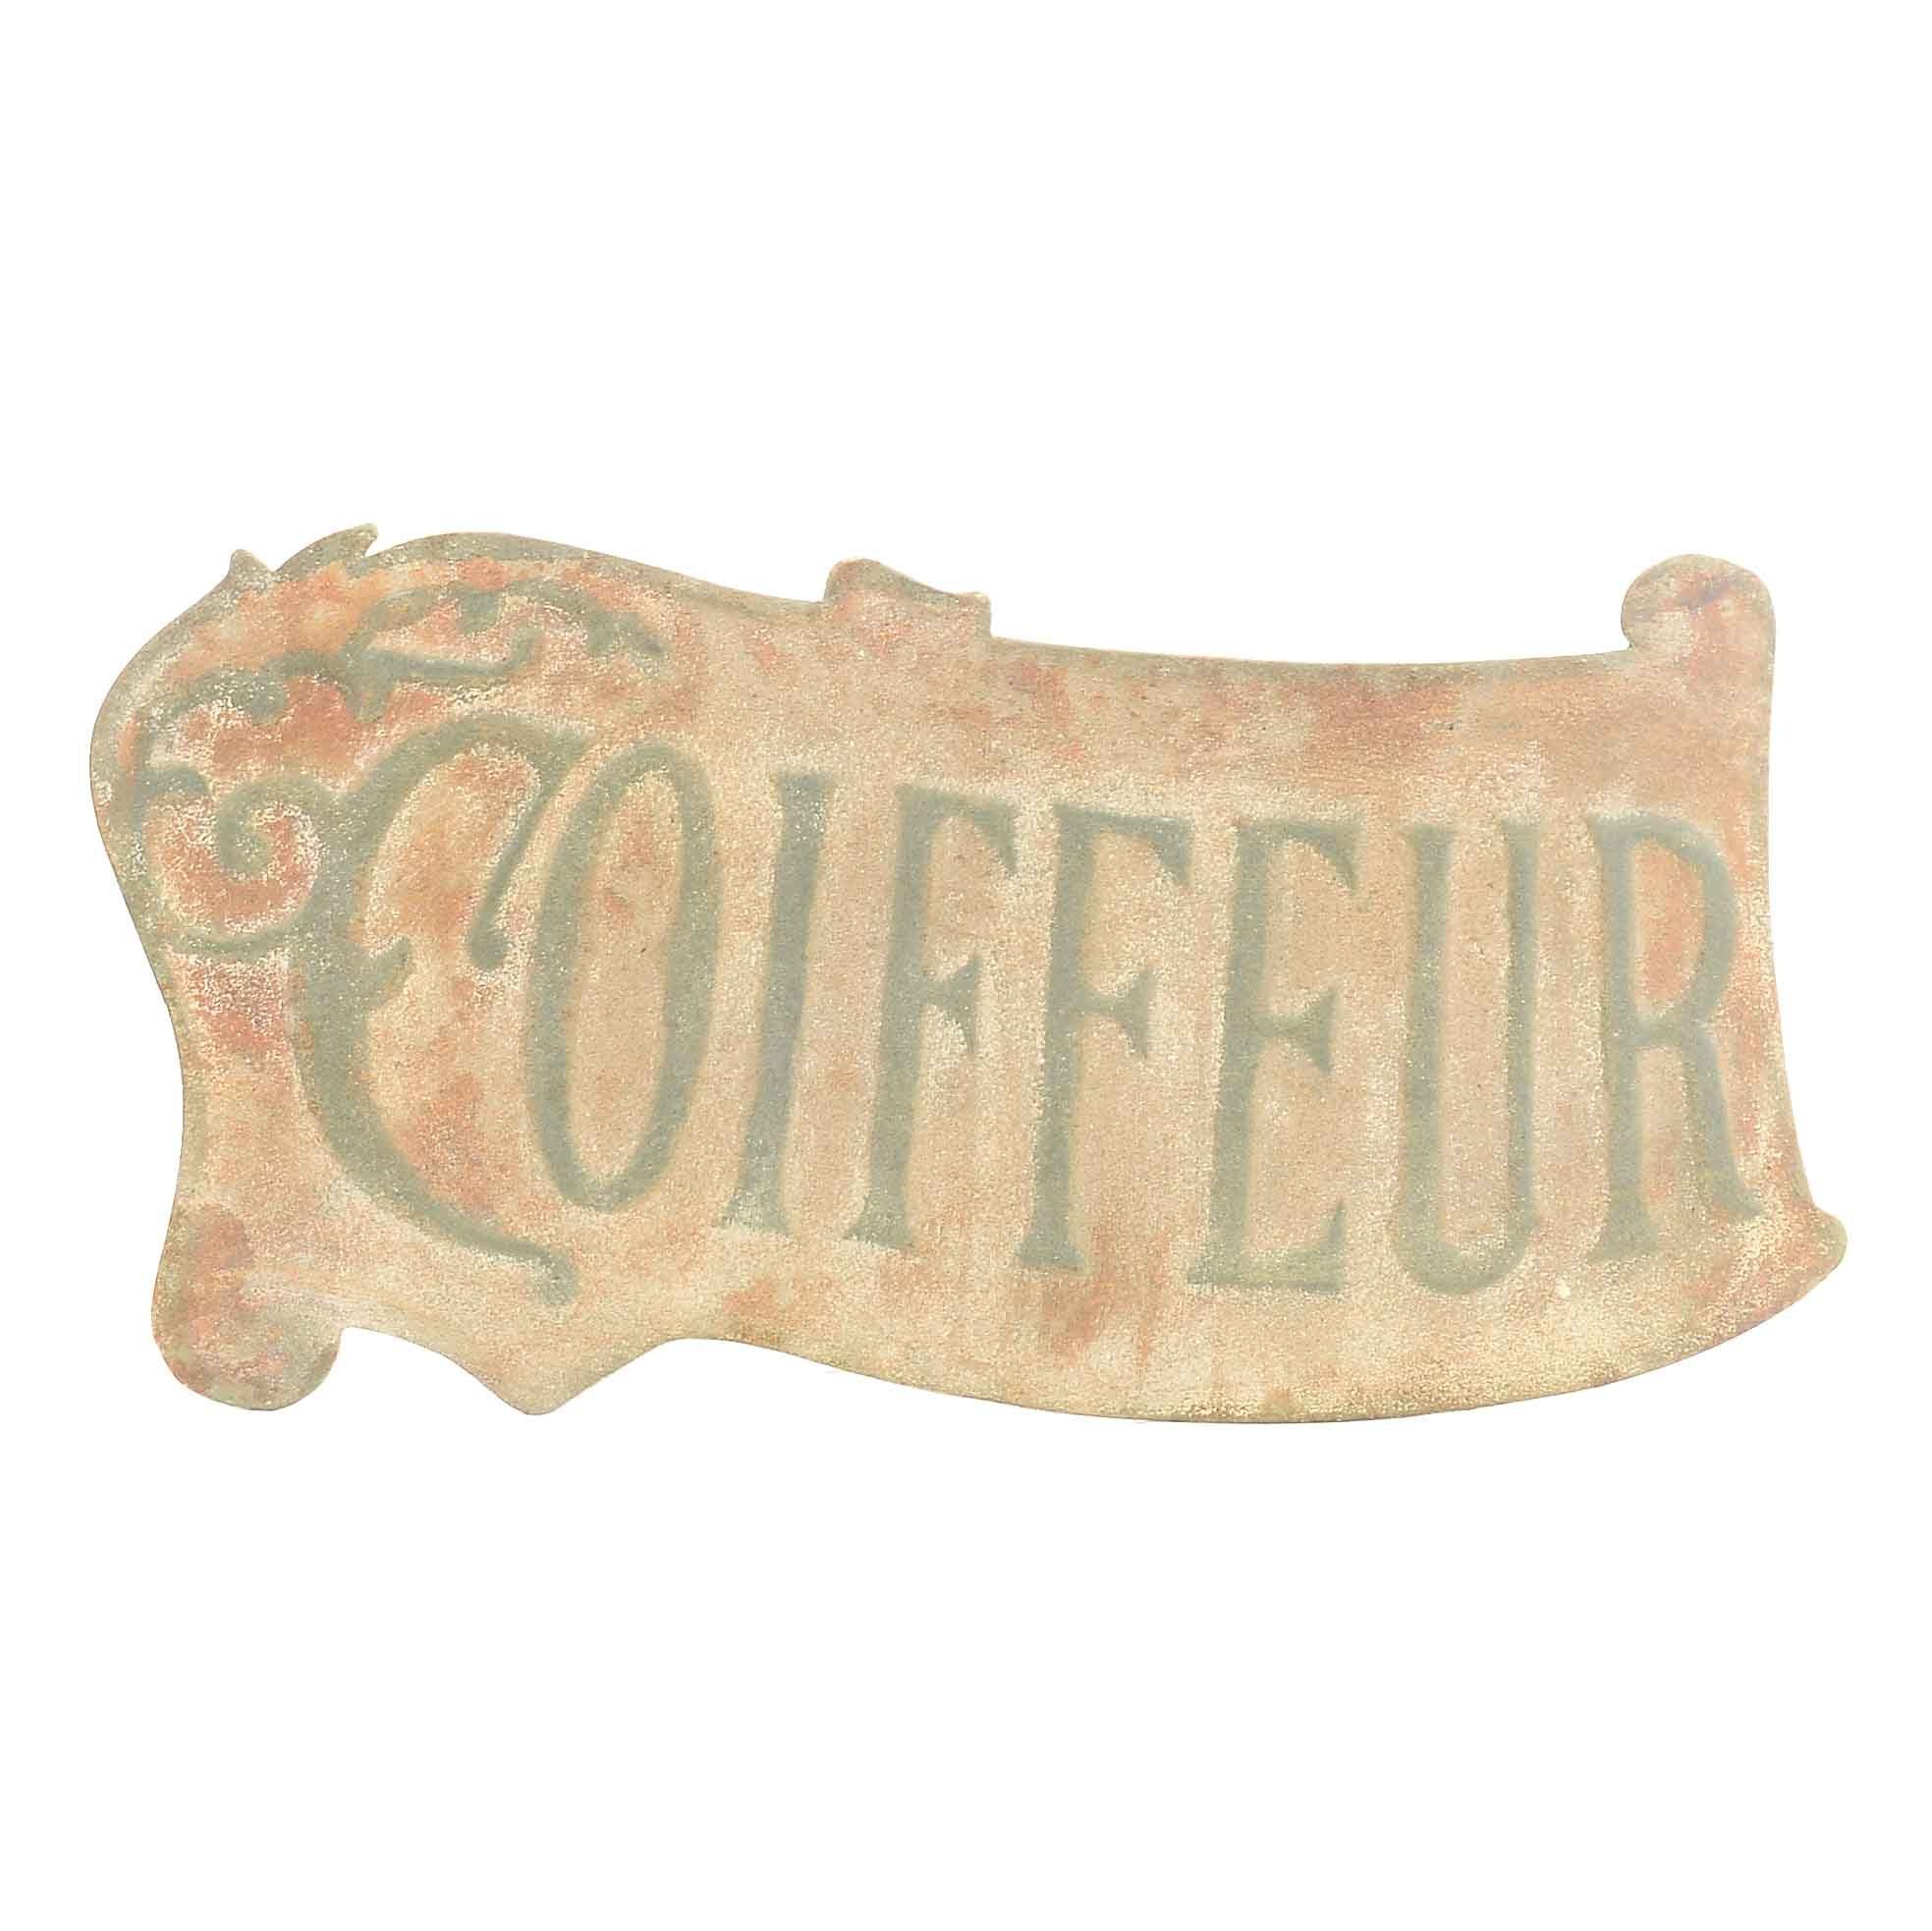 "Pressed Metal ""Coiffeur"" Hairdresser Sign"